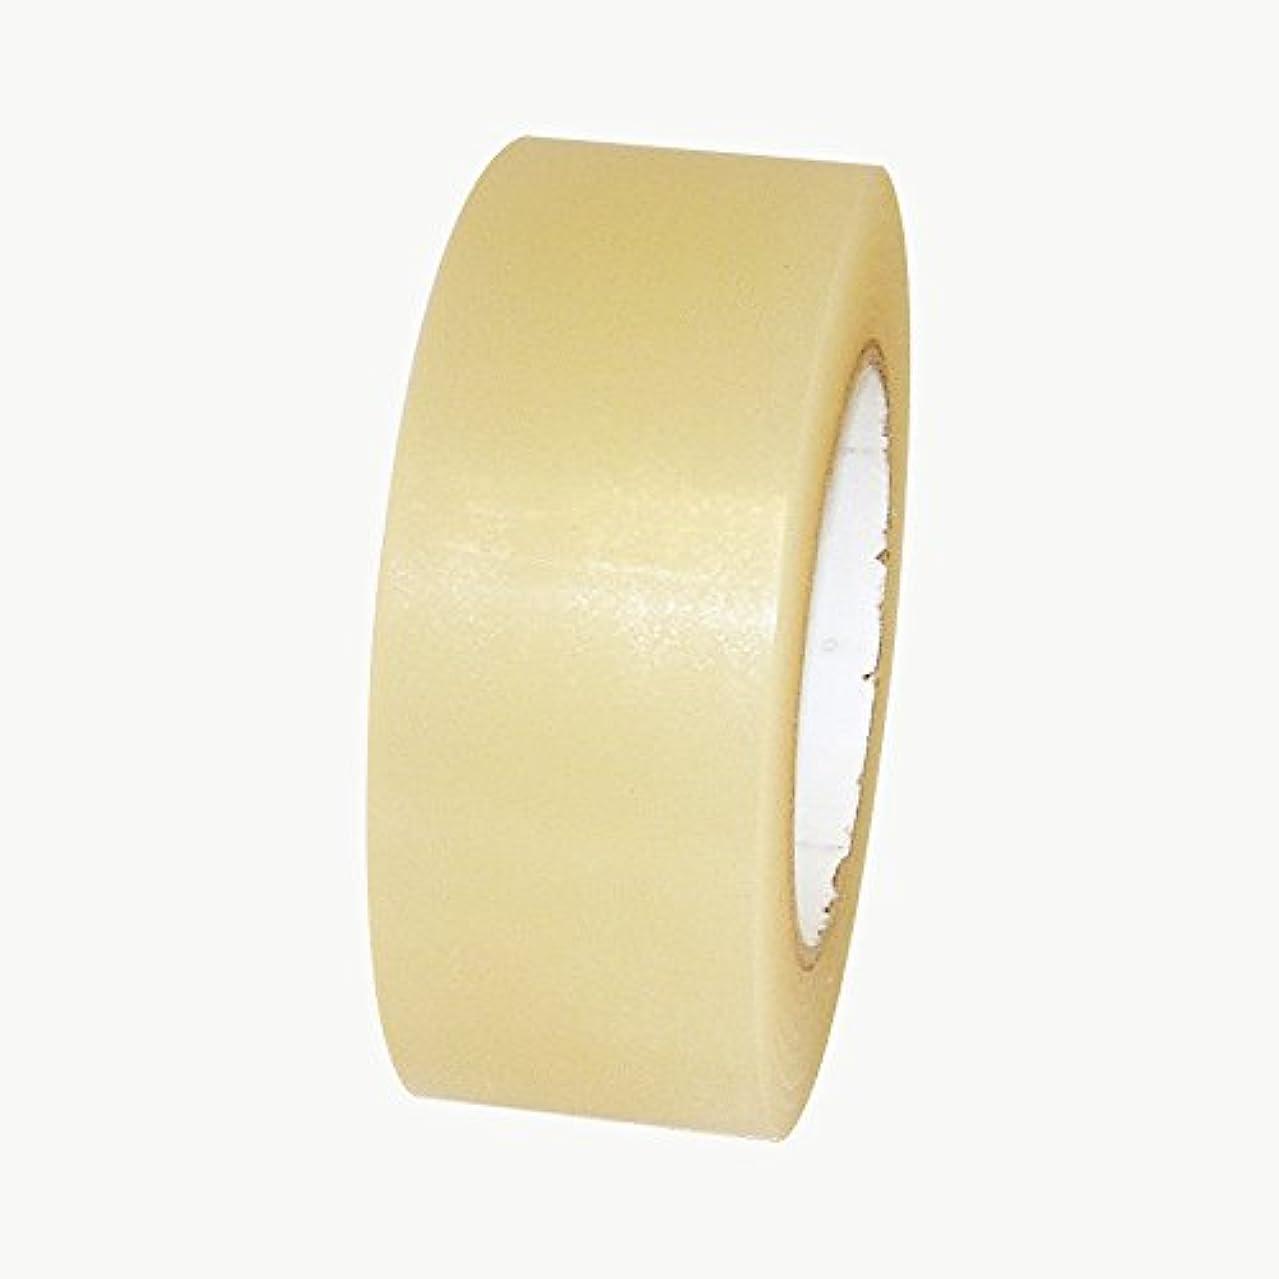 Scapa 136/CLR236 136 Polyethylene Film Tape: 2